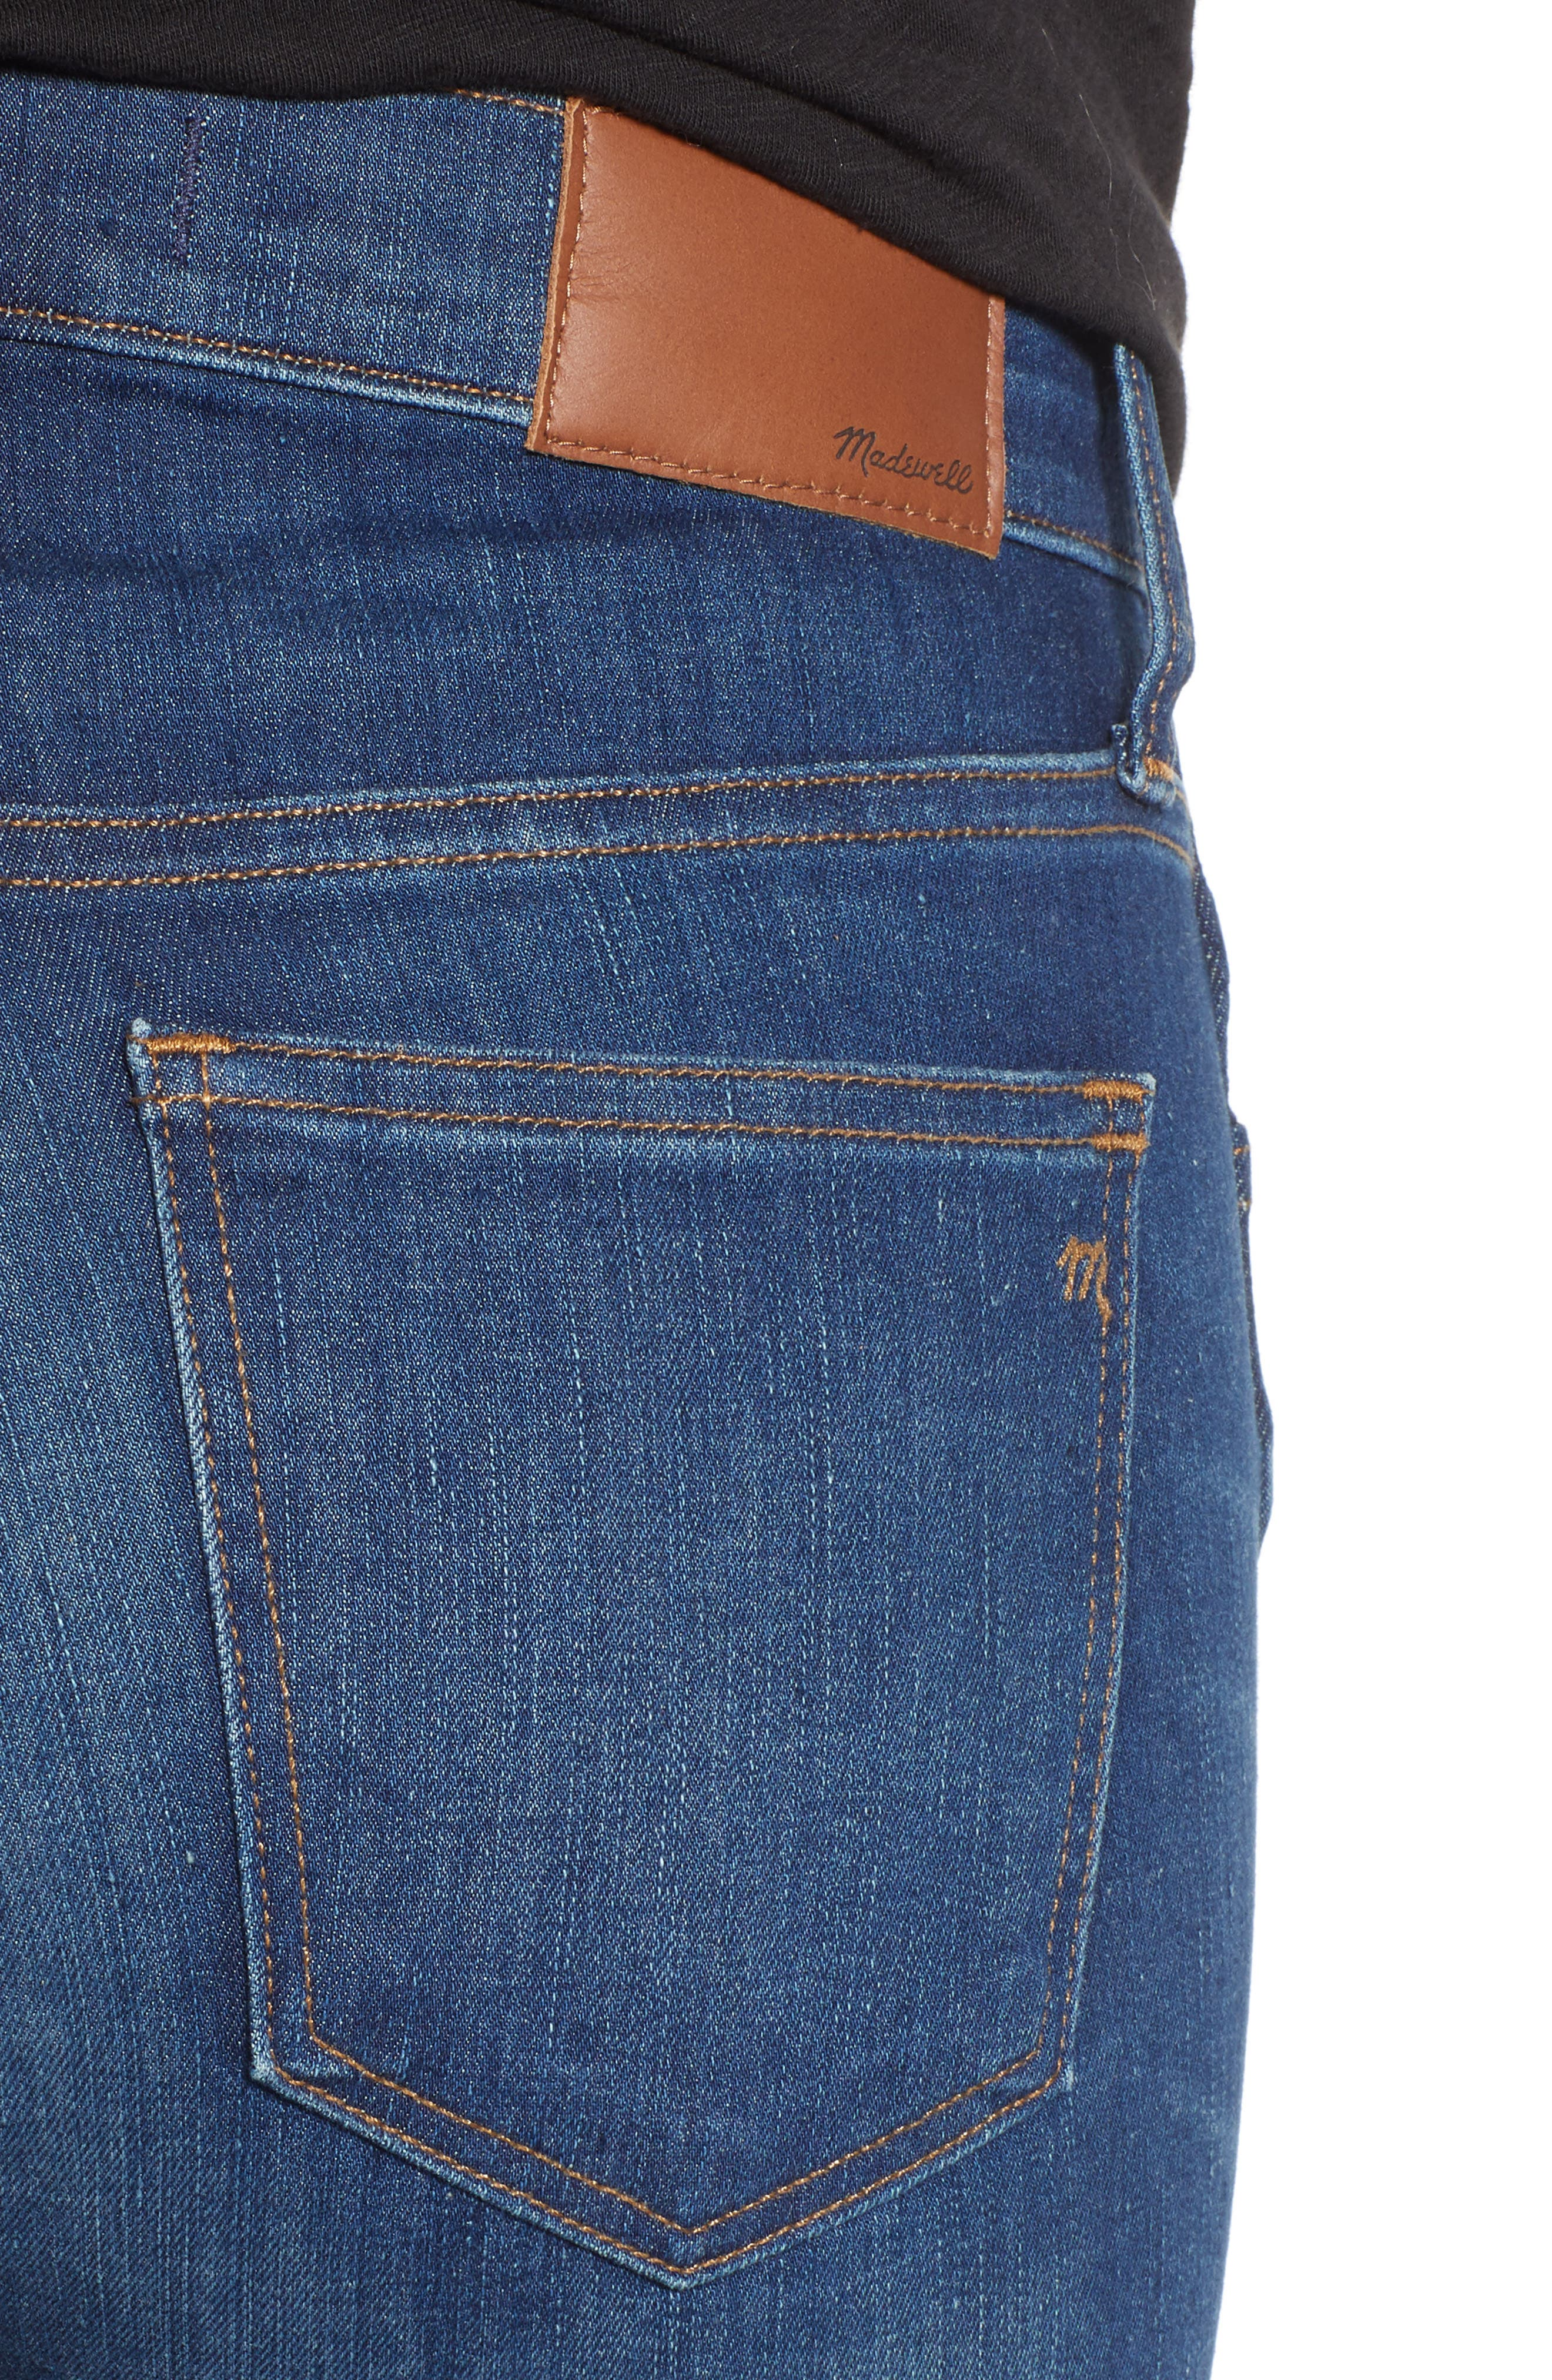 MADEWELL,                             9-Inch Skinny Jeans Raw Hem Edition,                             Alternate thumbnail 5, color,                             PALOMA